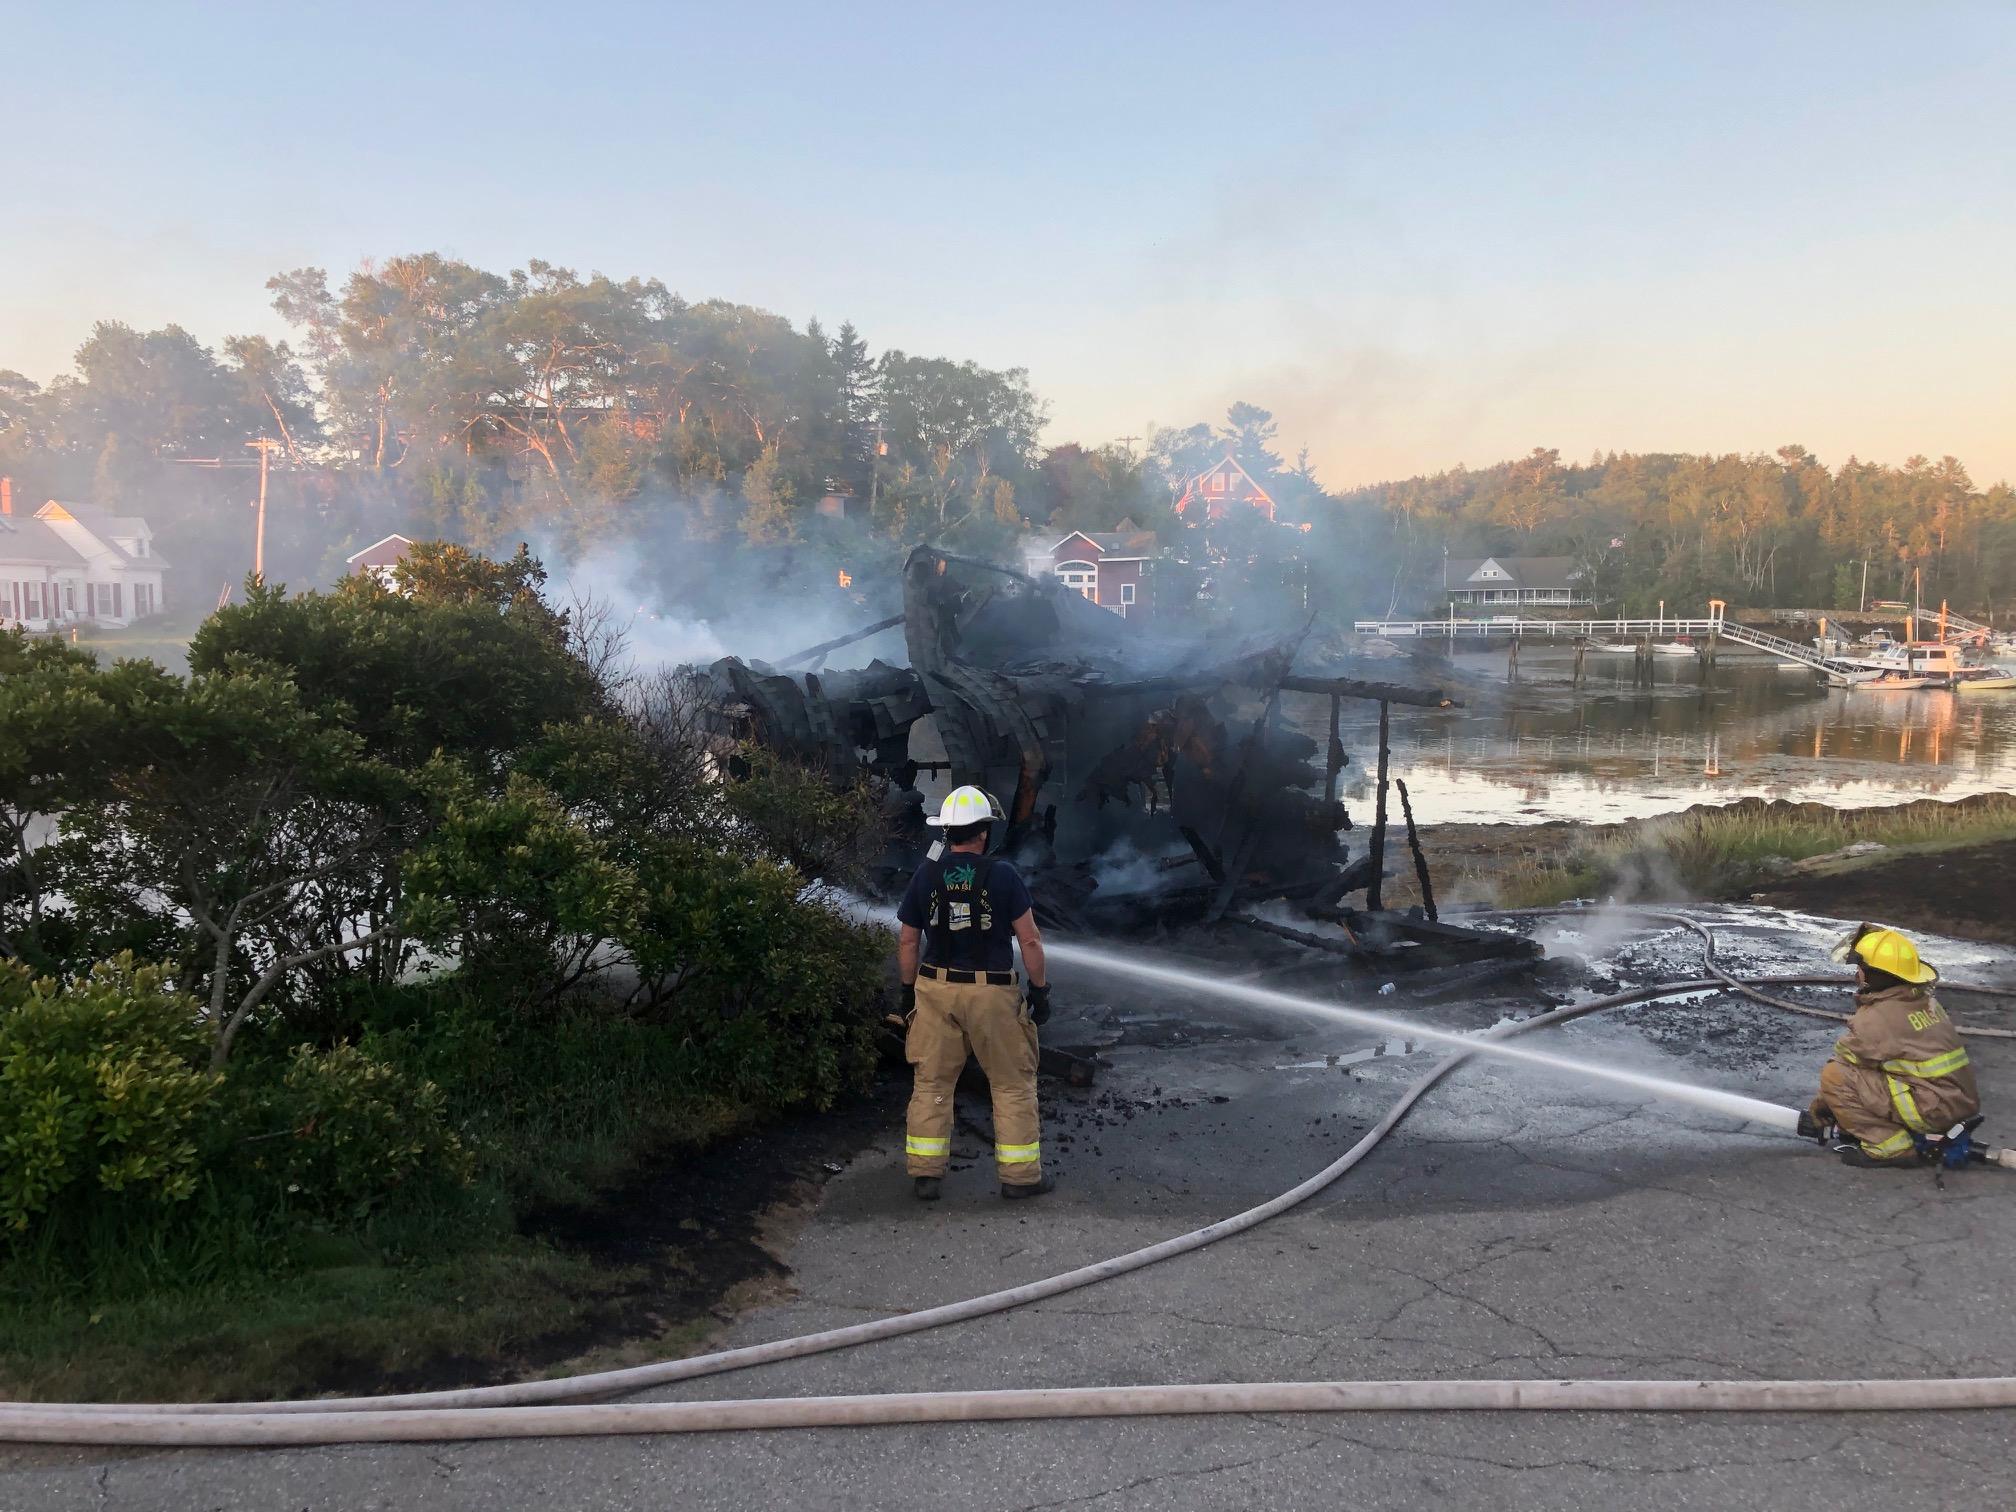 Christmas Bristol County 2020 Barn Burns Down in Christmas Cove   The Lincoln County News